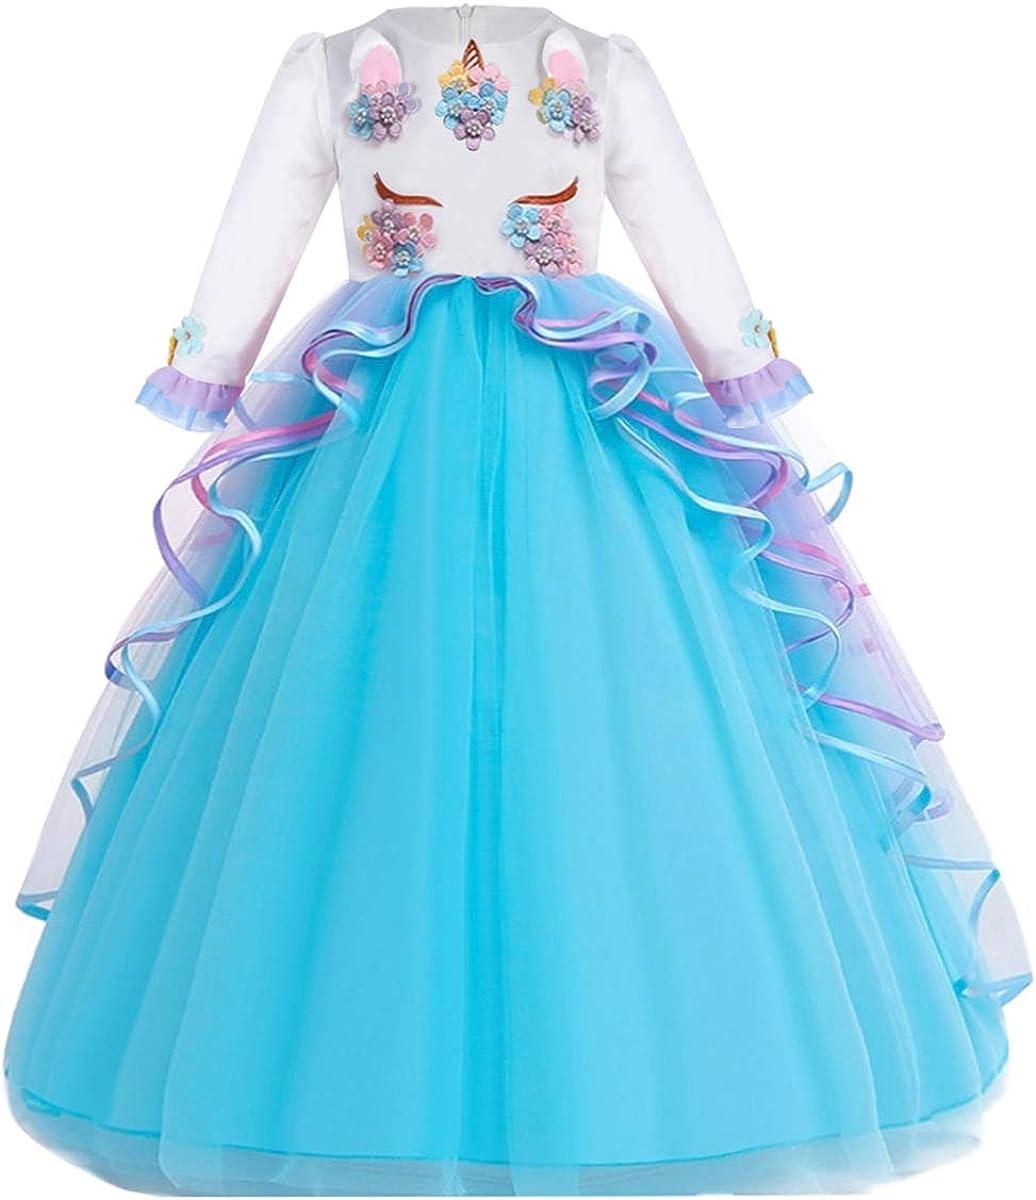 MYRISAM Girl's shipfree Unicorn Ranking TOP15 Birthday Princess Tulle Long Dress Sleeve